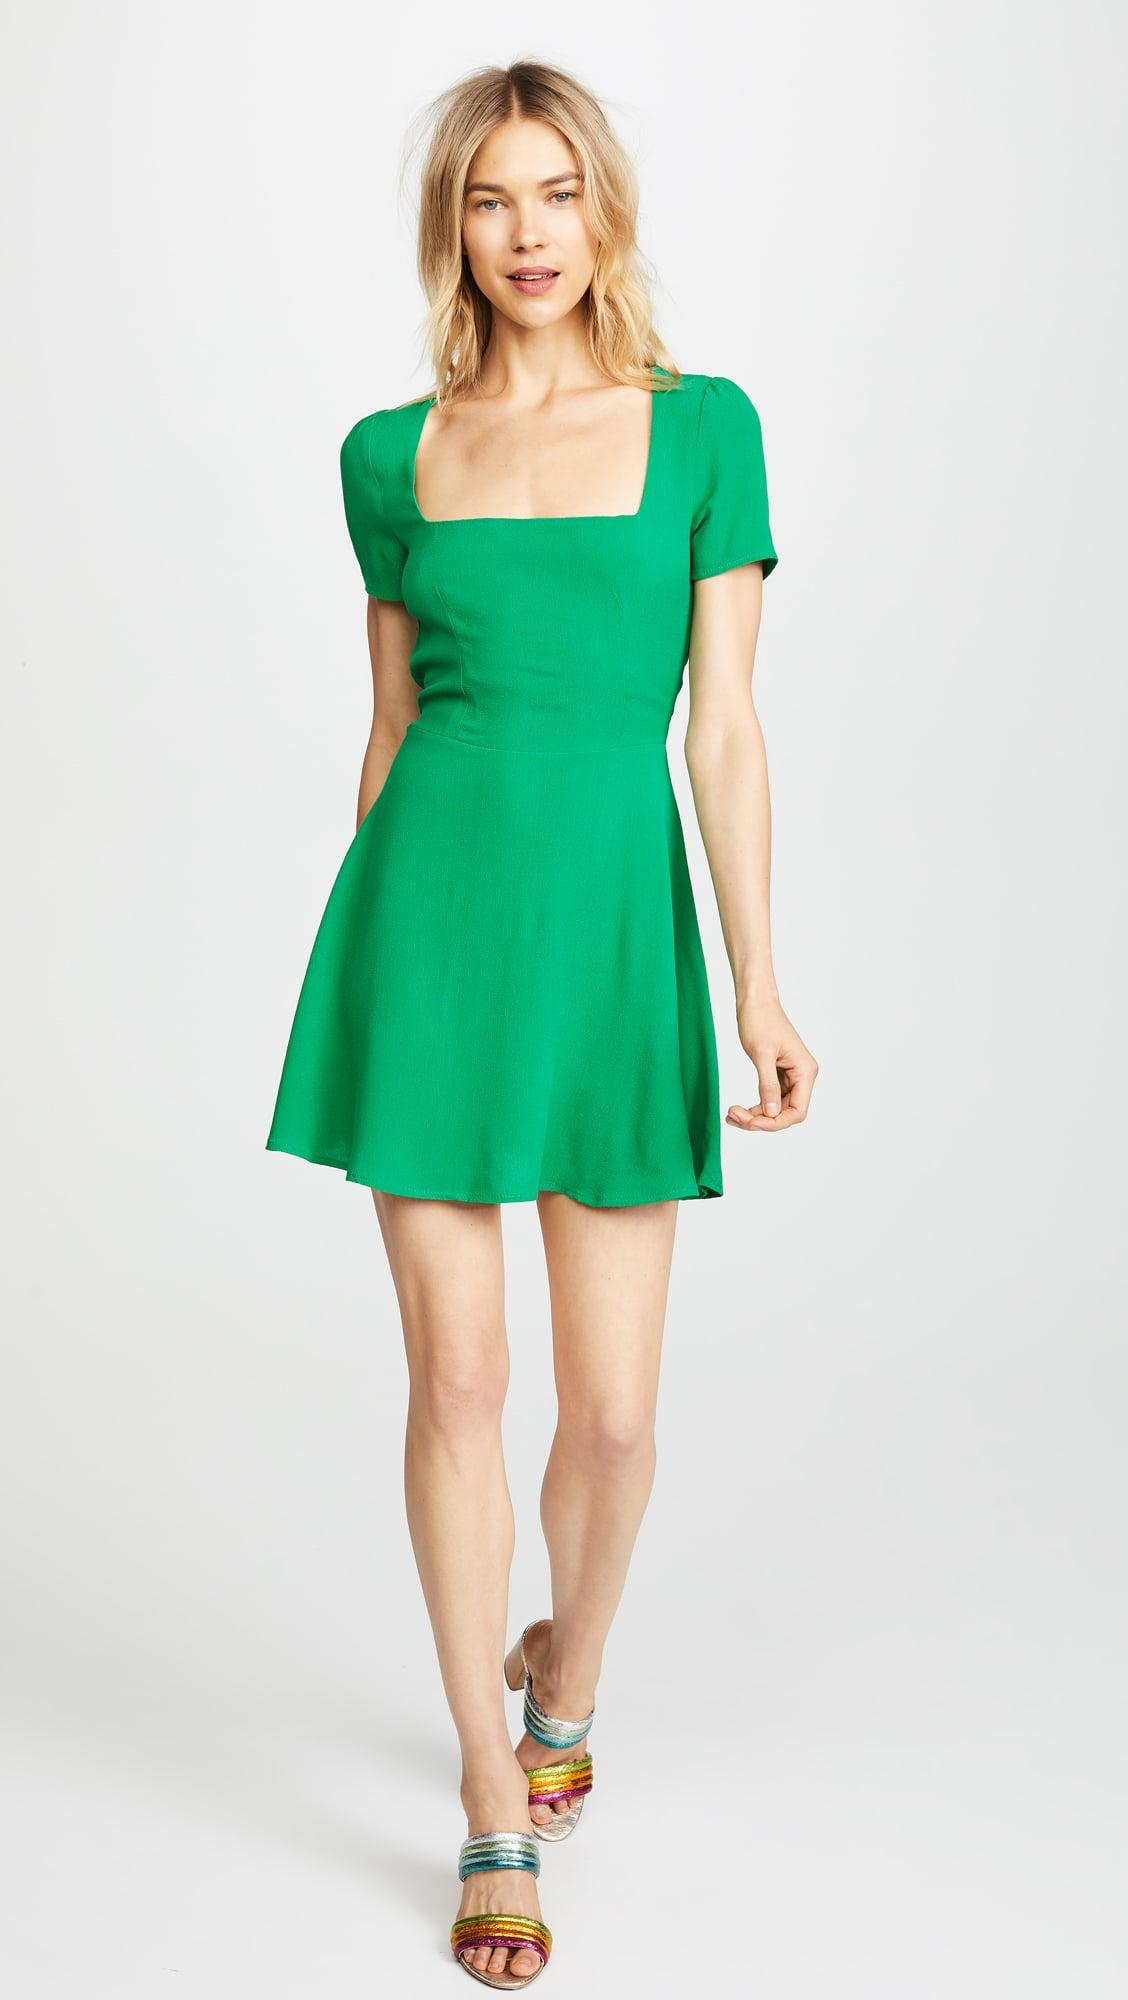 52a5bcf0b0ea Our Pick: Flynn Skye Maiden Mini Dress | If